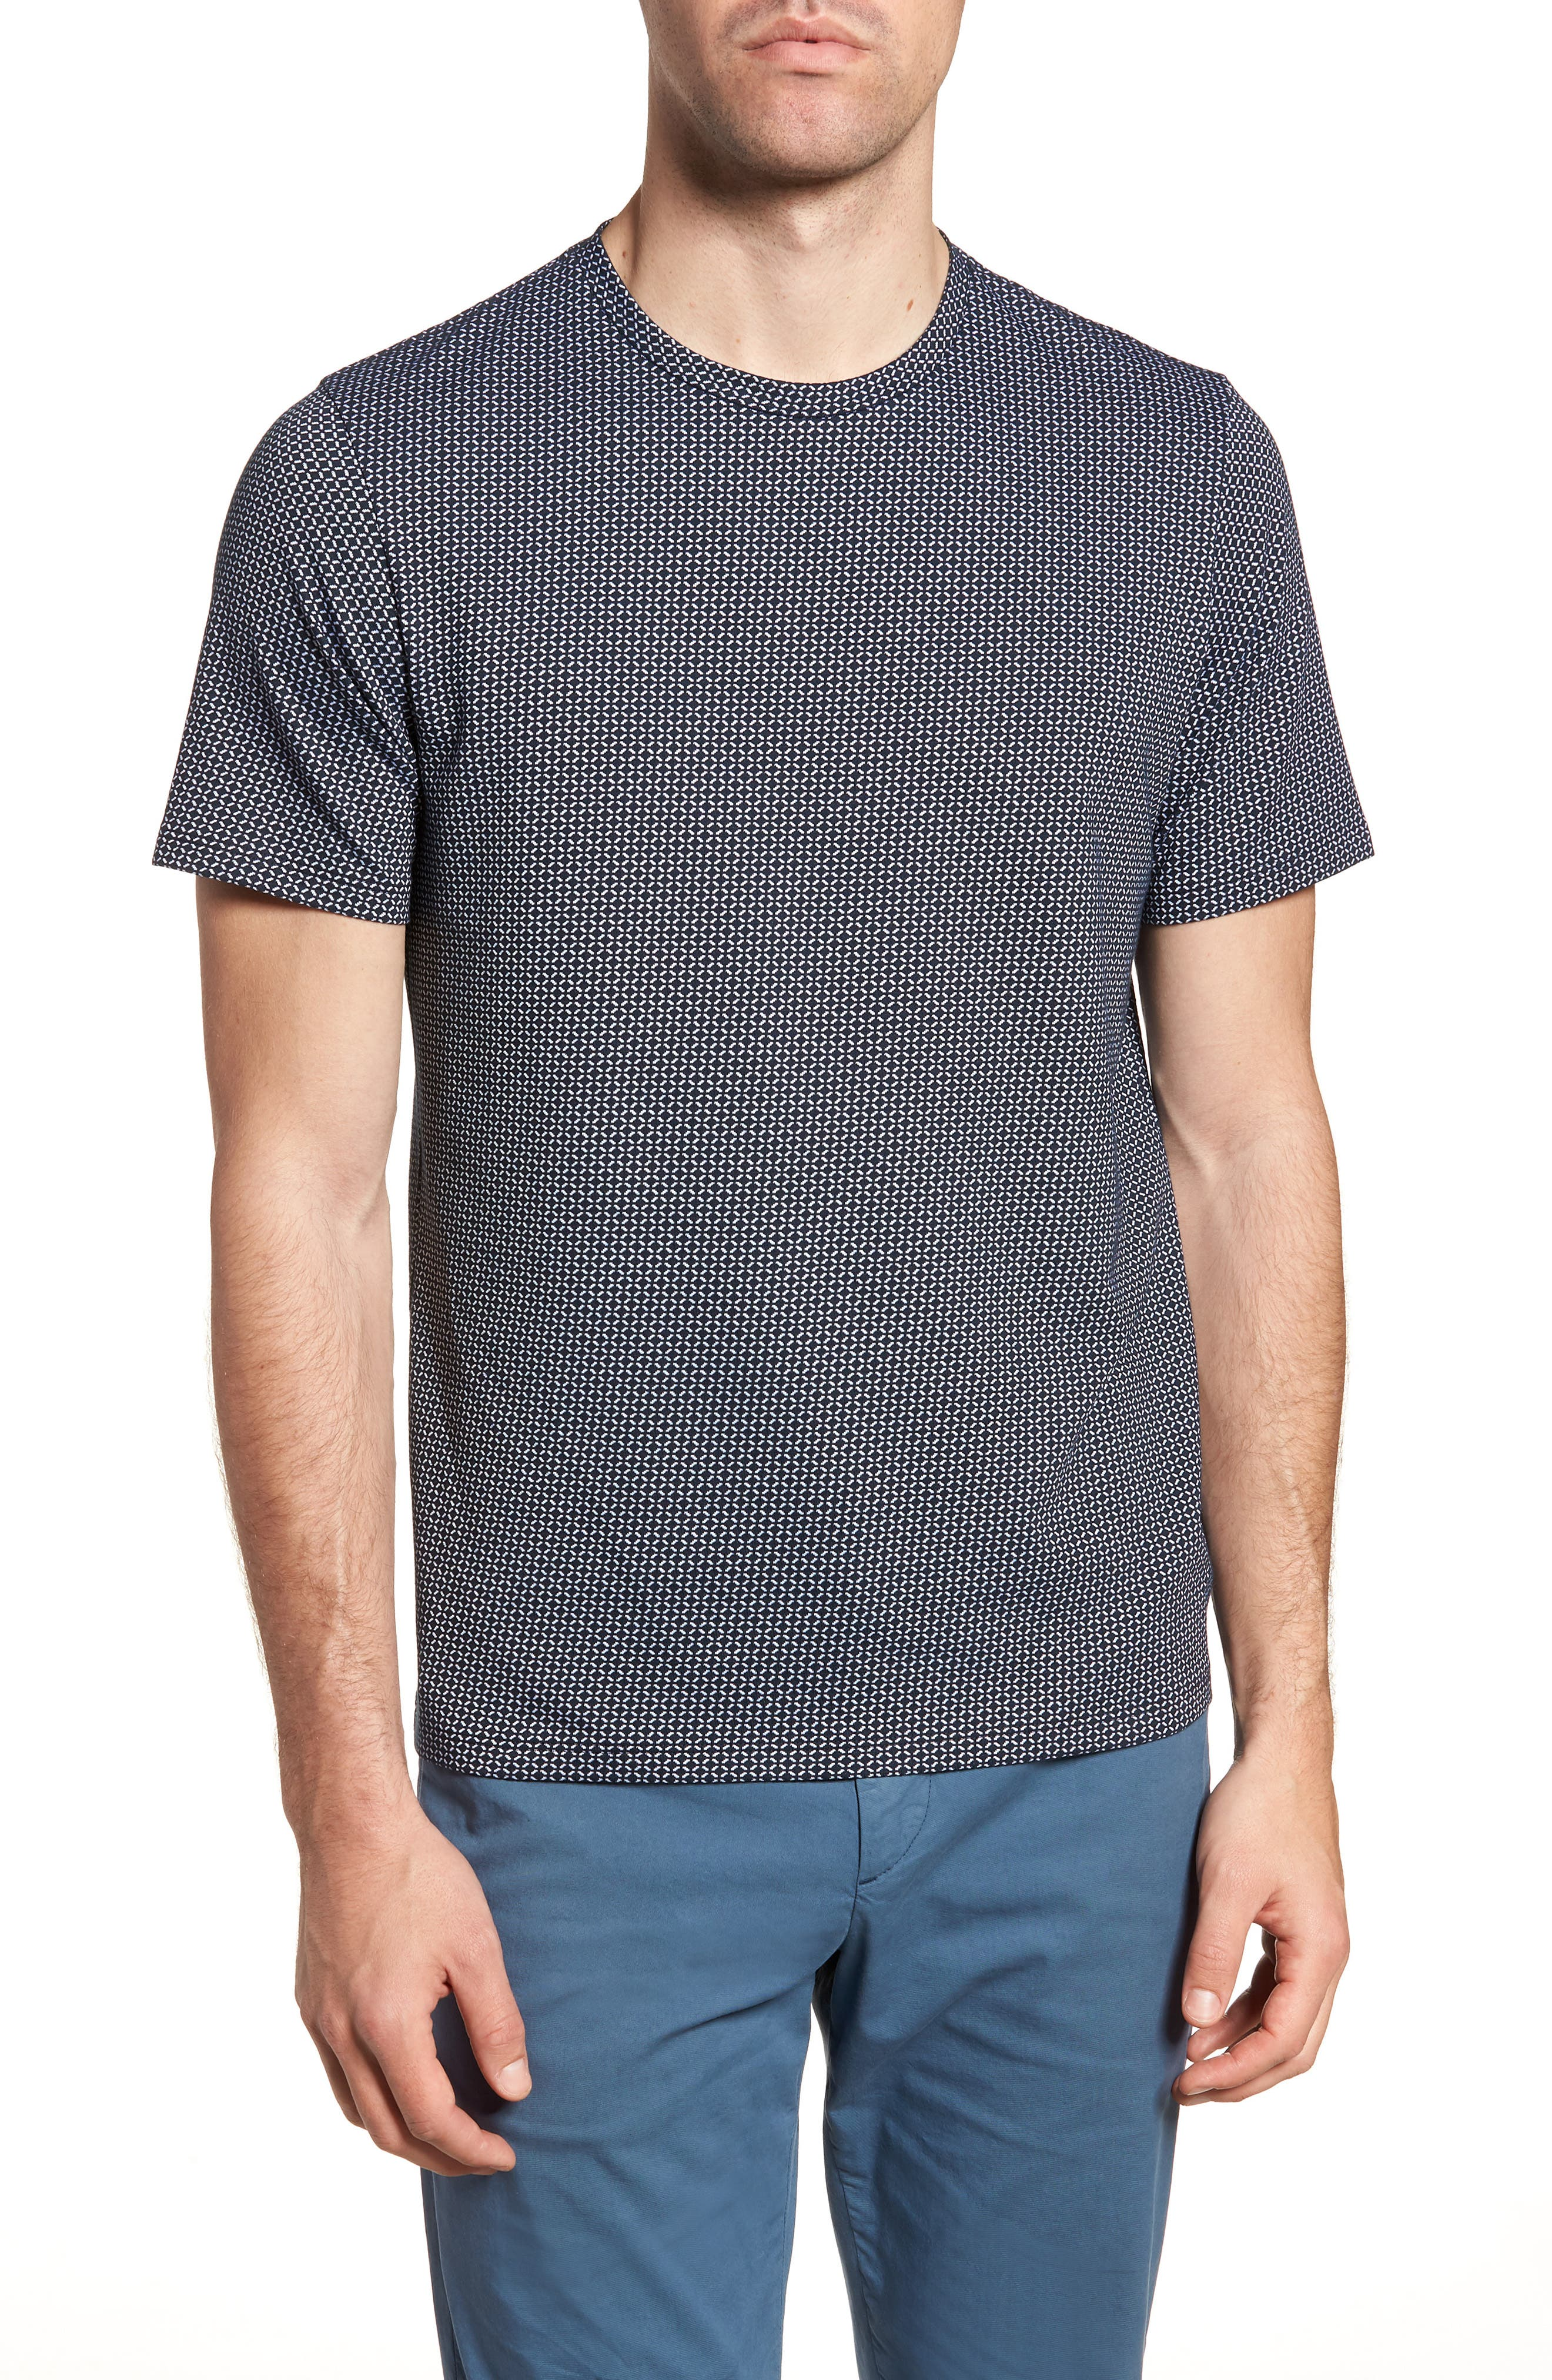 Sillar Print Crewneck T-Shirt,                             Main thumbnail 1, color,                             Eclipse/ White